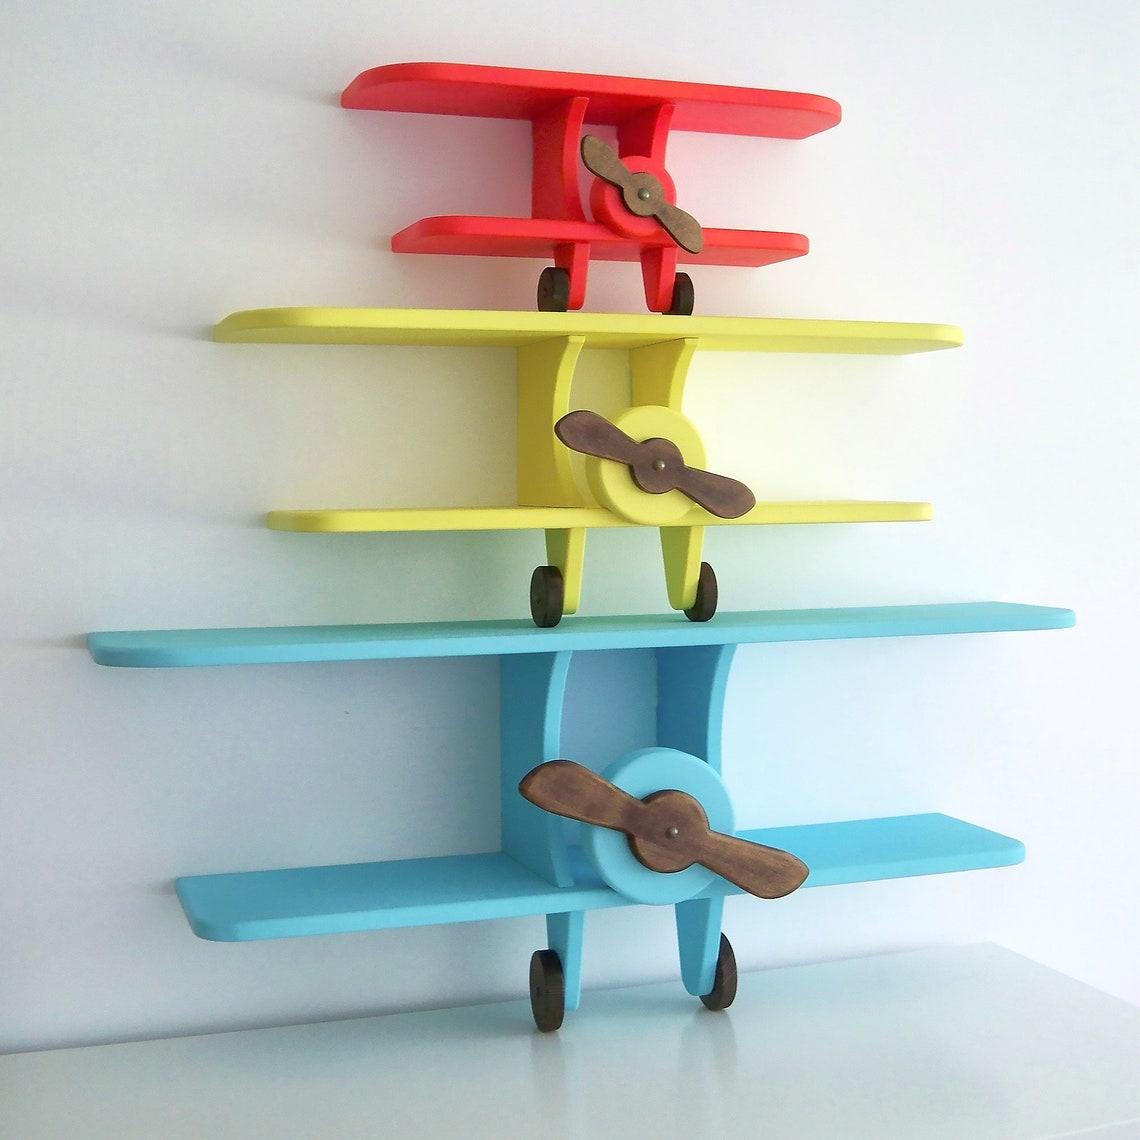 Airplane Shelf Wooden Airplane Biplane Book Shelf DIY baby and child room decoration, wall decoration